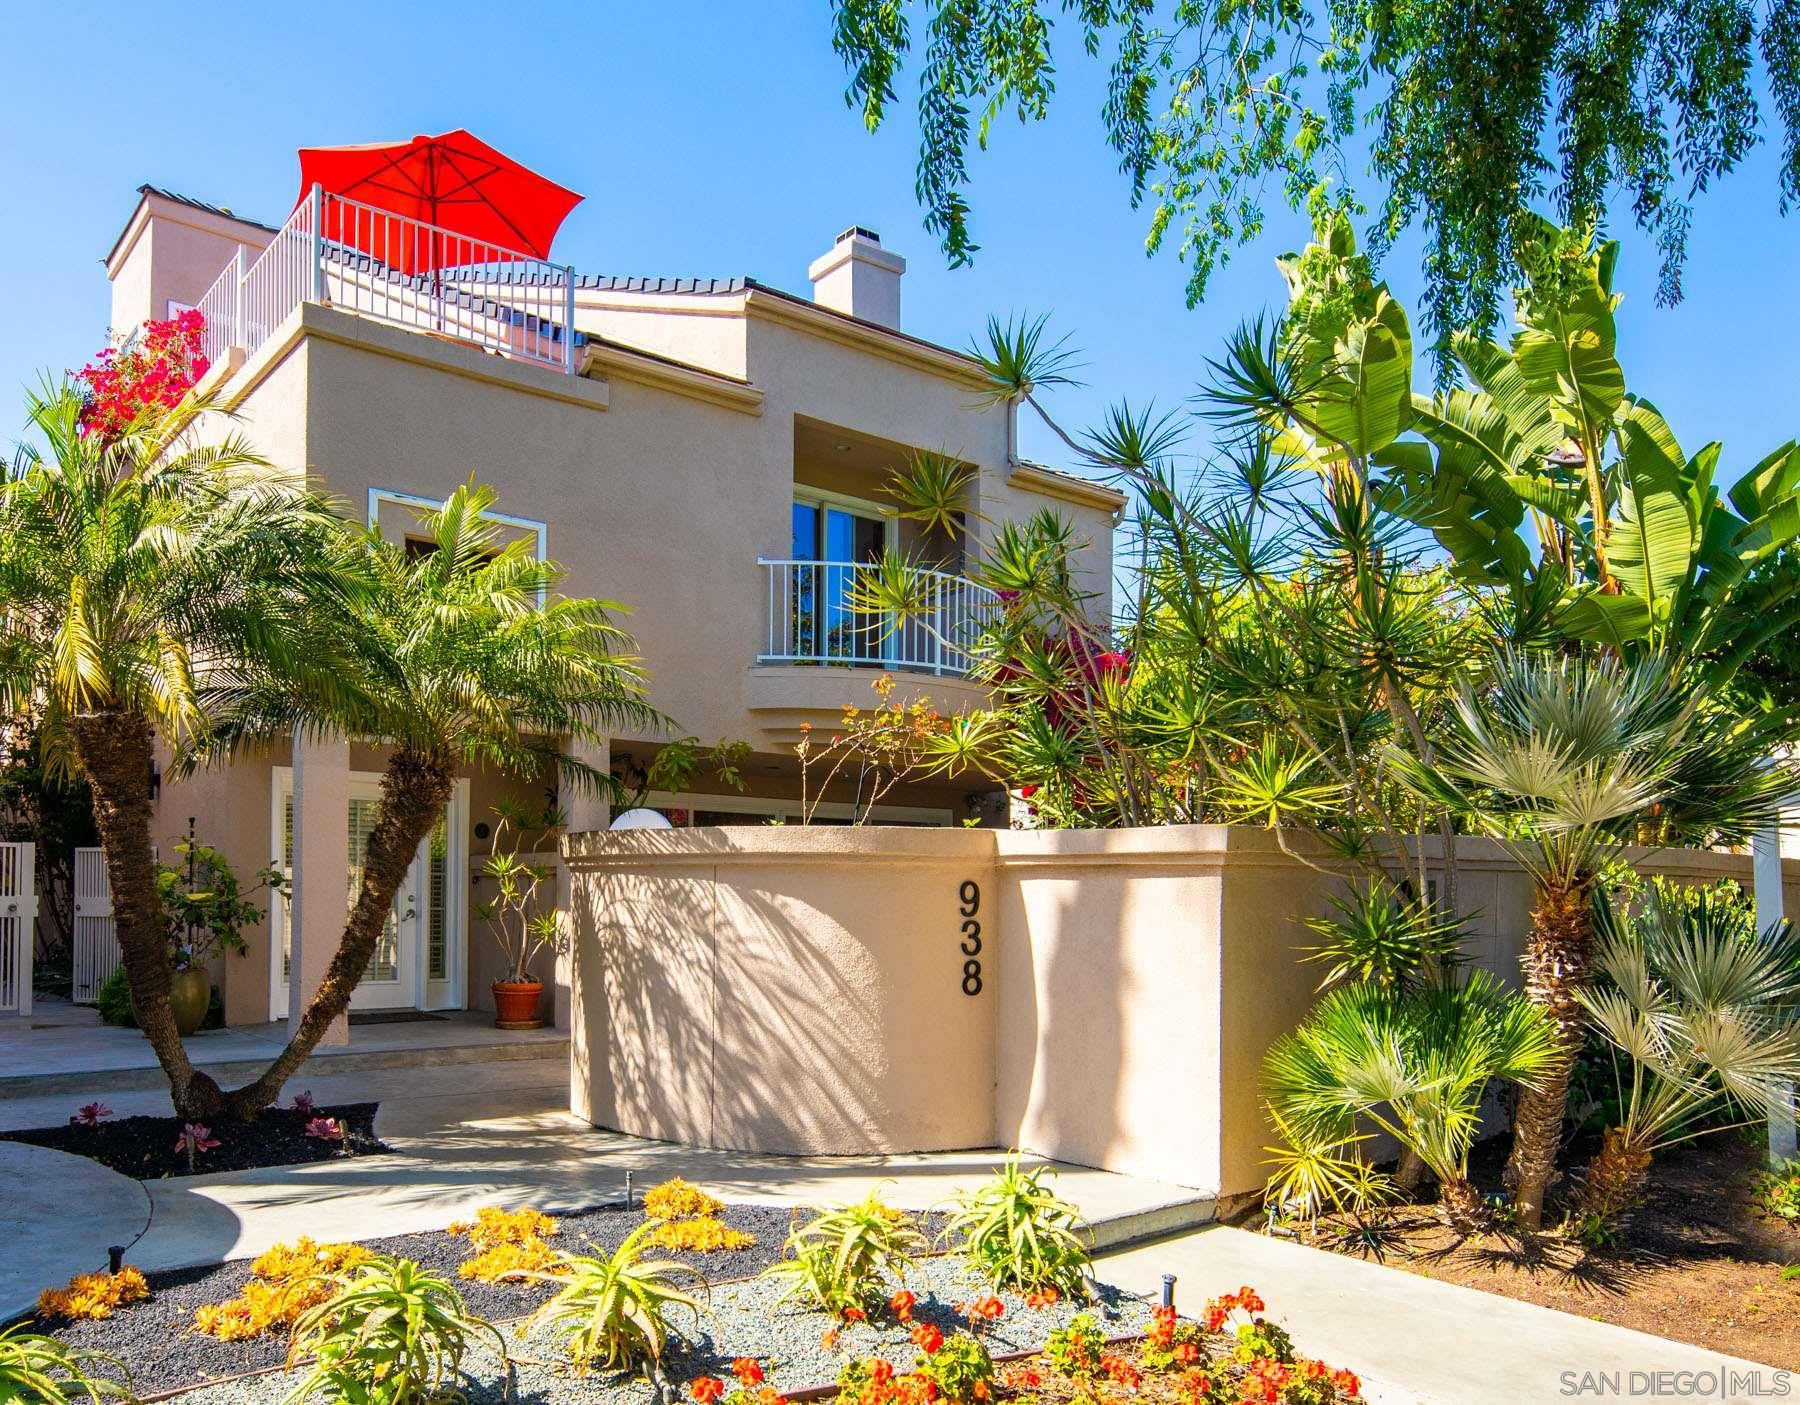 938 D Avenue, Coronado, California 92118, 4 Bedrooms Bedrooms, ,3 BathroomsBathrooms,Townhouse,For Sale,938 D Avenue,2,210008754